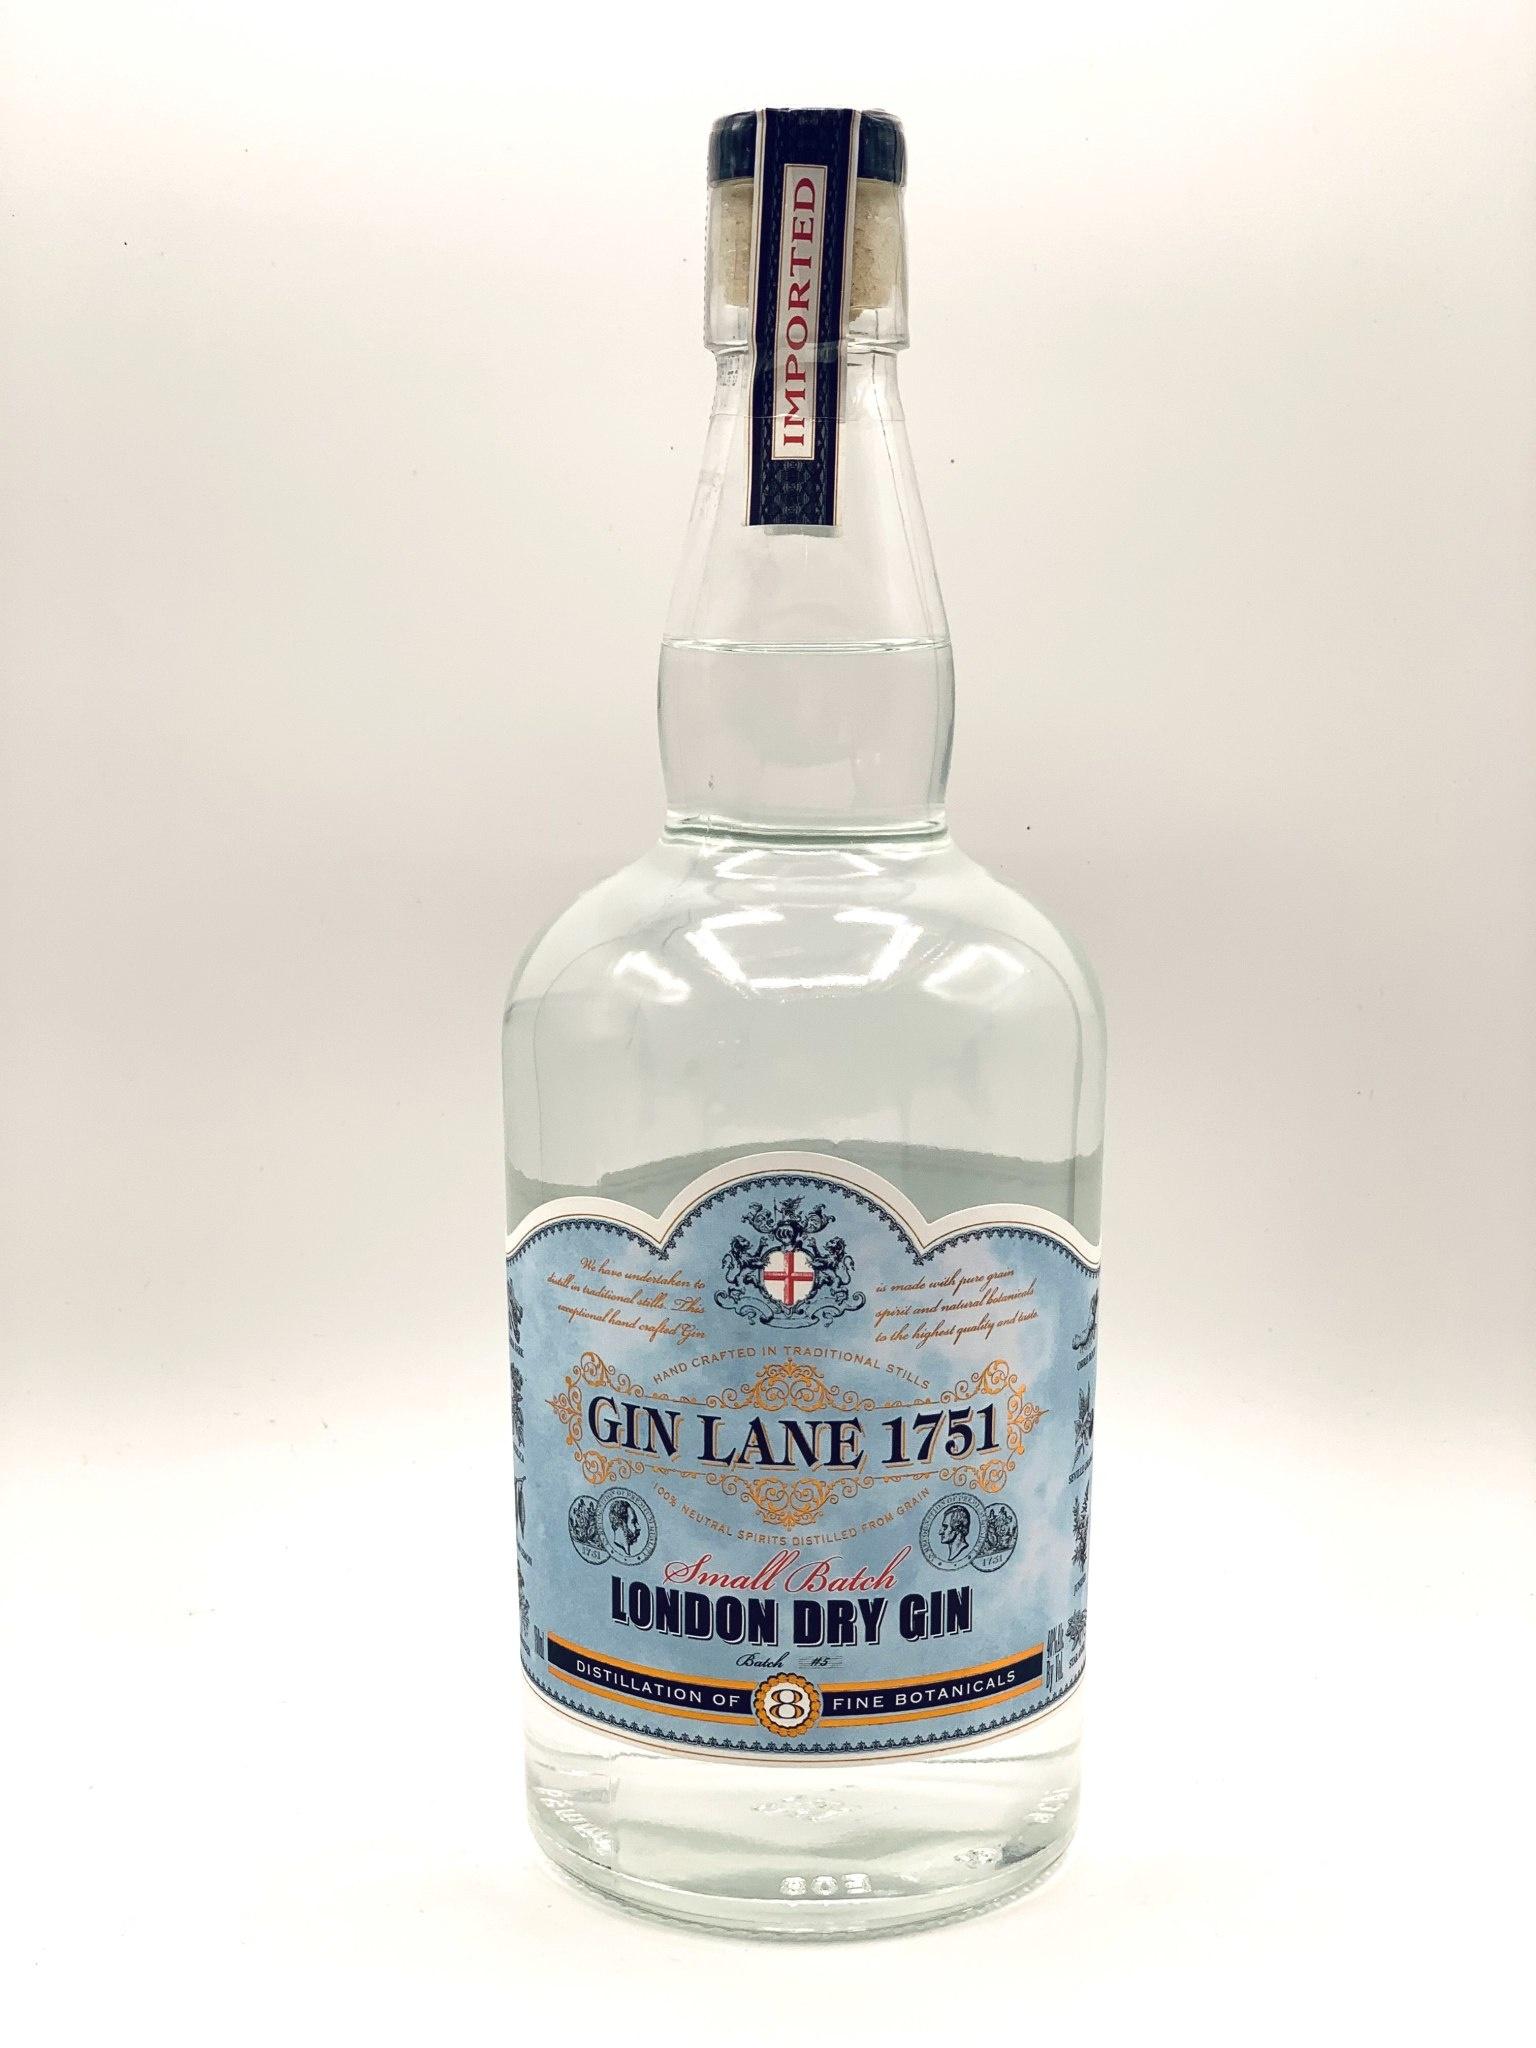 Gin Lane 1751 Small Batch London Dry Gin 750ml (80 Proof)